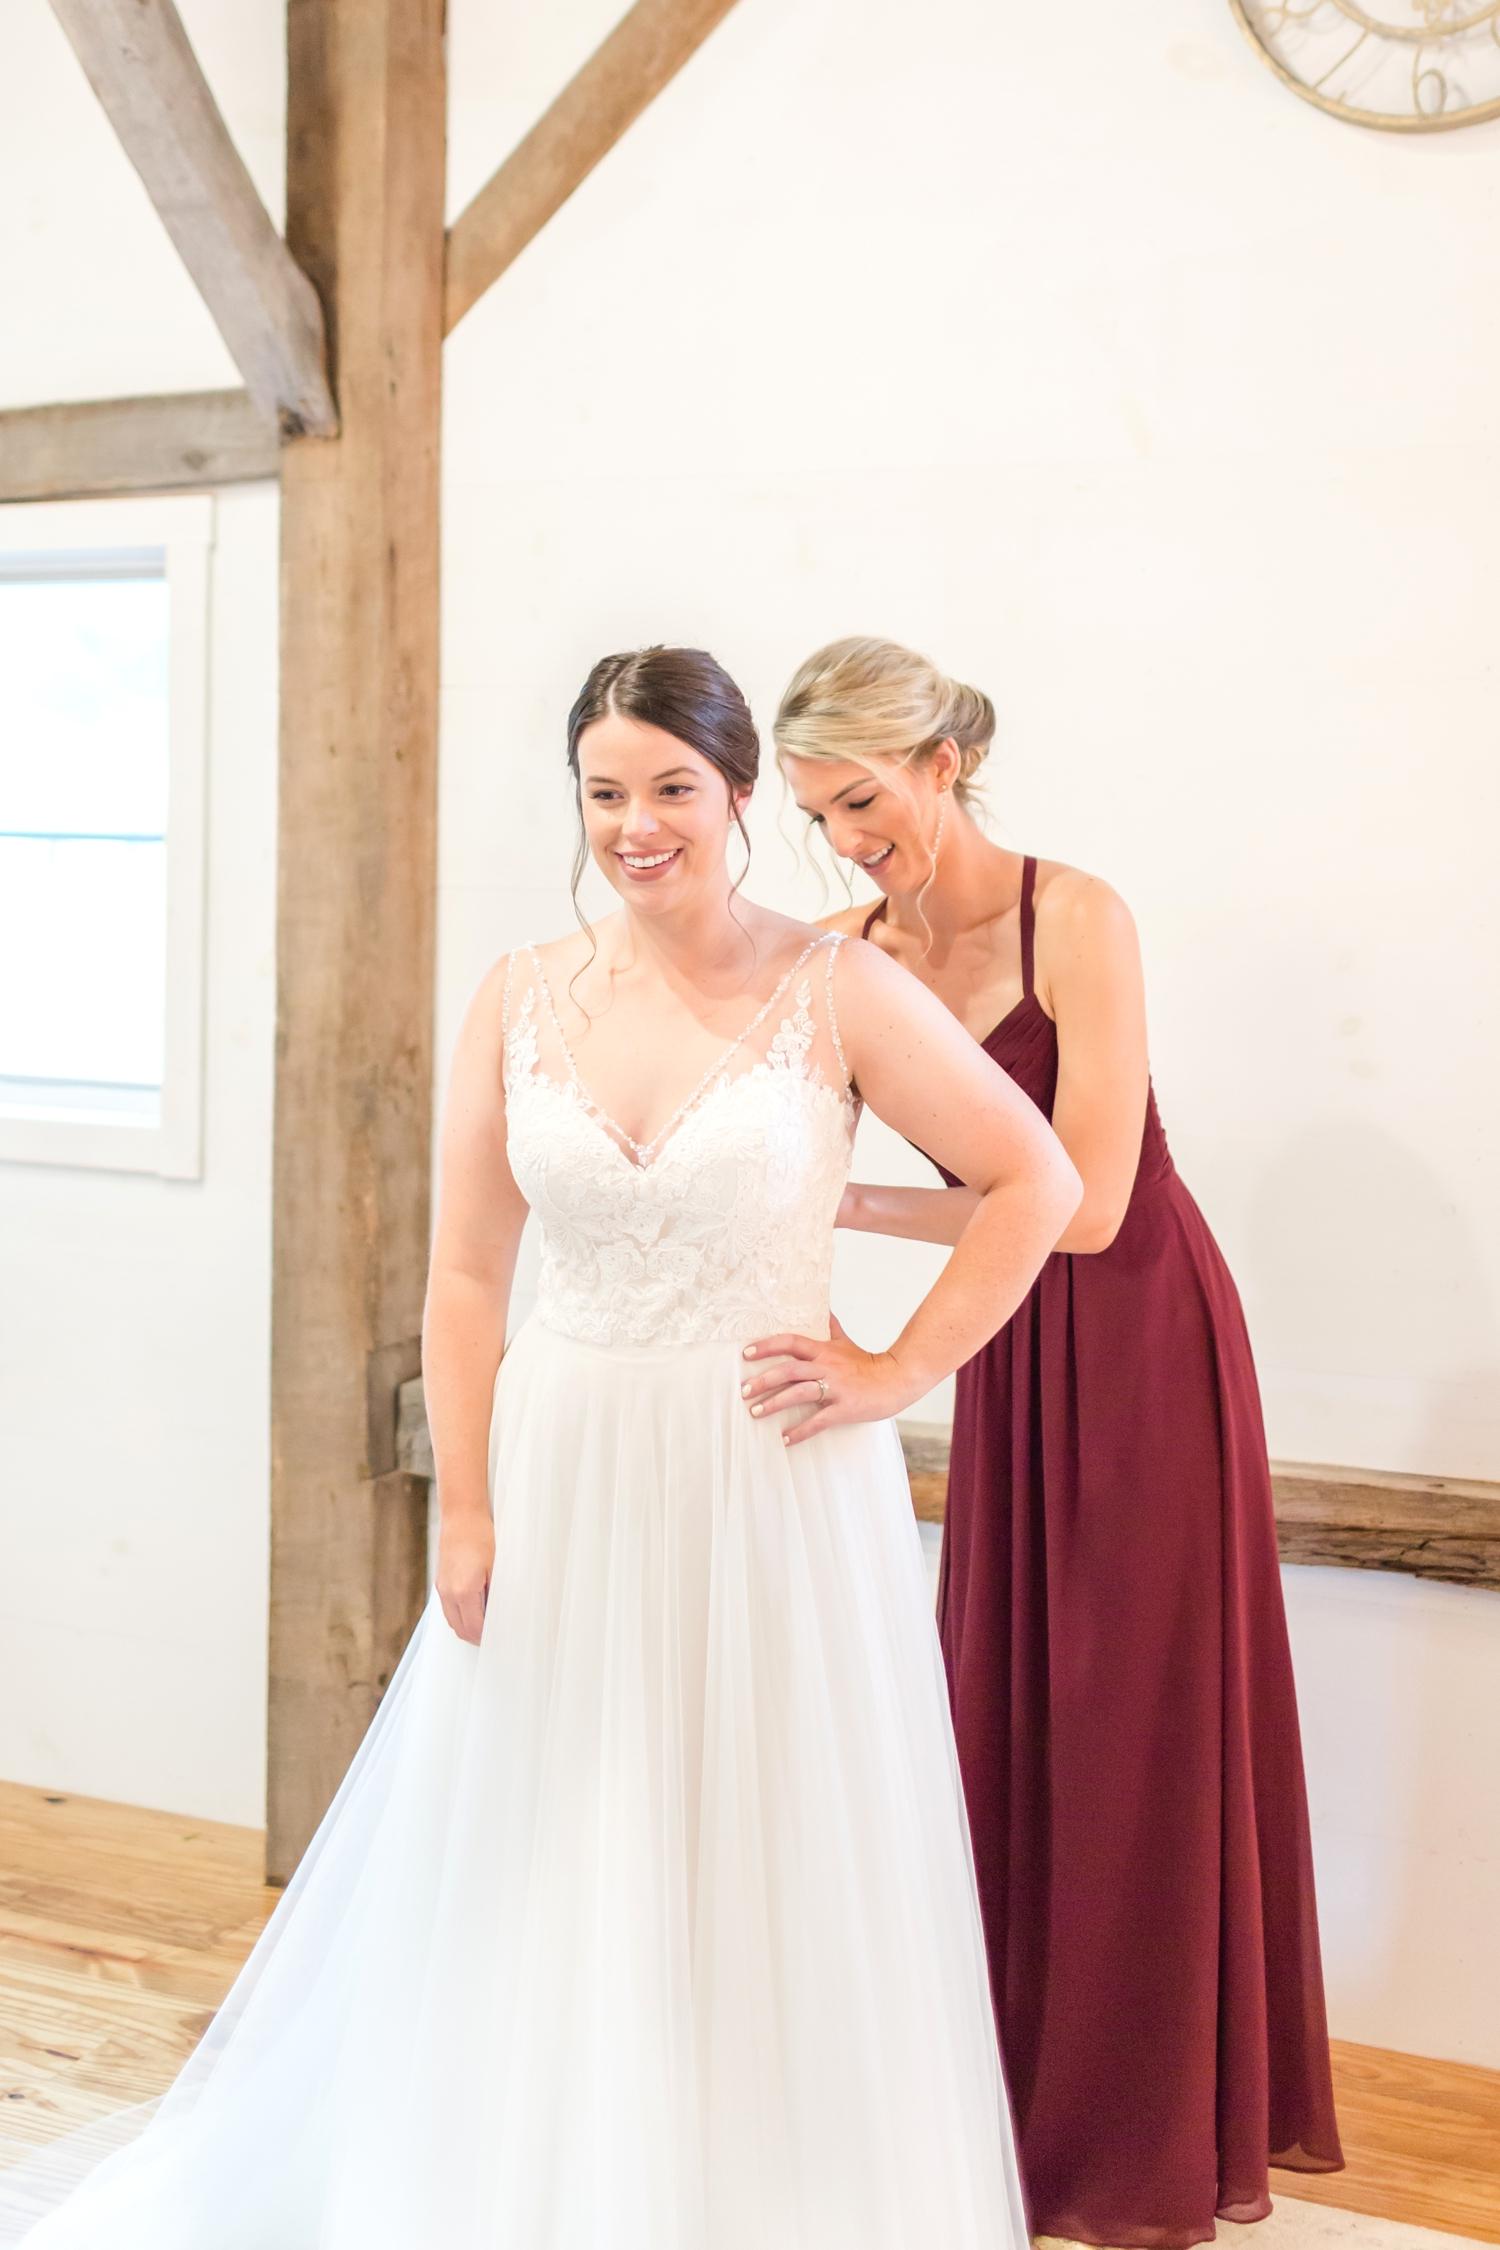 ADKINS WEDDING HIGHLIGHTS-64_The-Granary-wedding-Valley-Pike-Farm-Market-Virginia-wedding-photographer-anna-grace-photography-photo.jpg